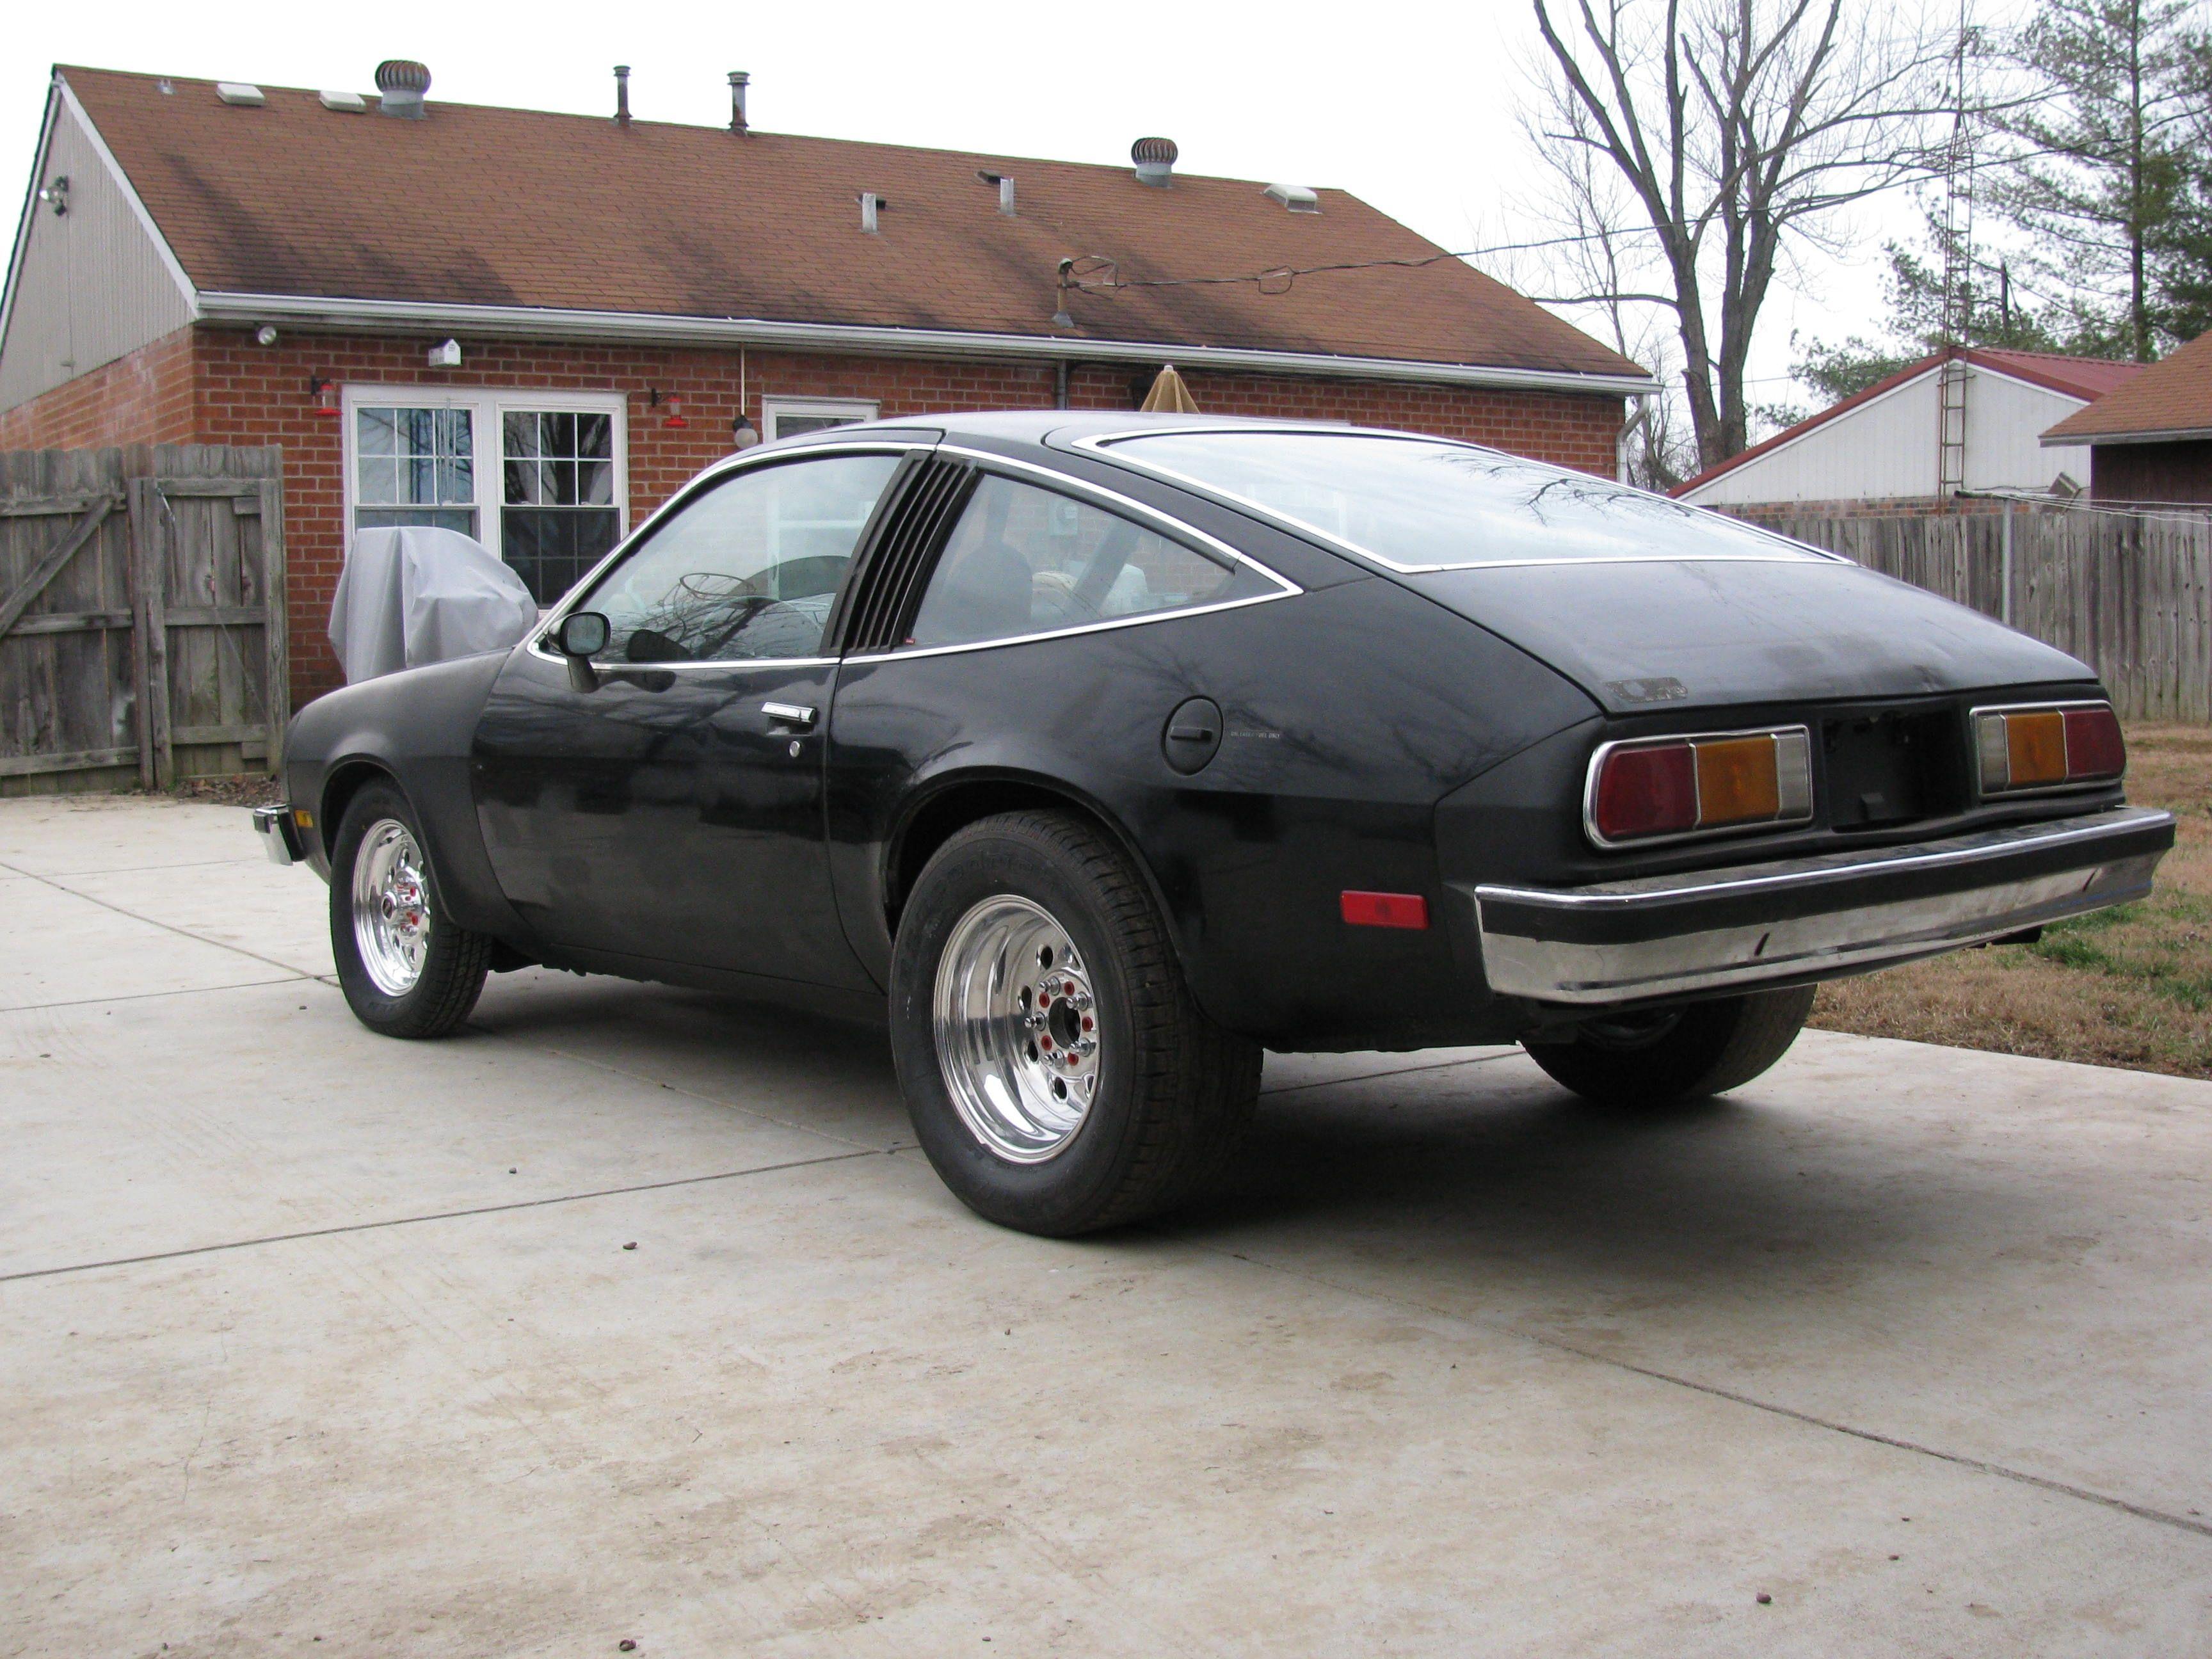 Chevrolet Monza 1980 Bigjay897 1980 Chevrolet Monza 10772901